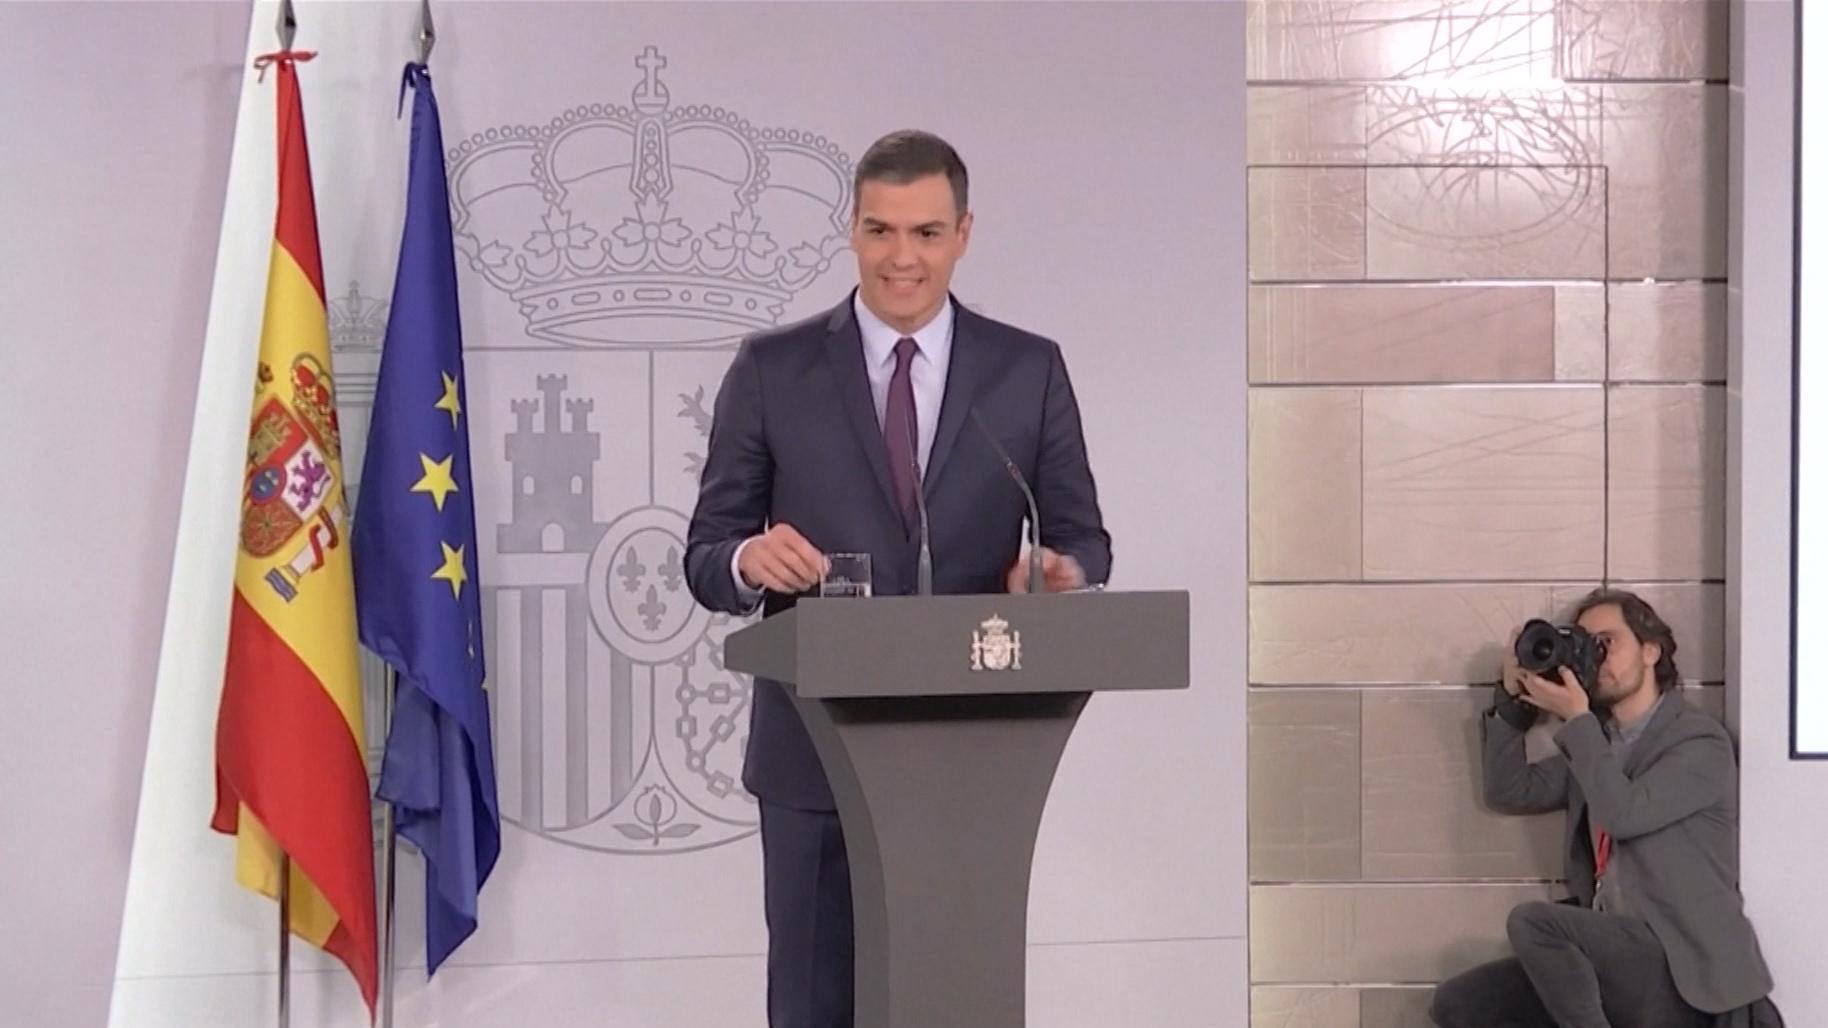 Premier Pedro Sánchez